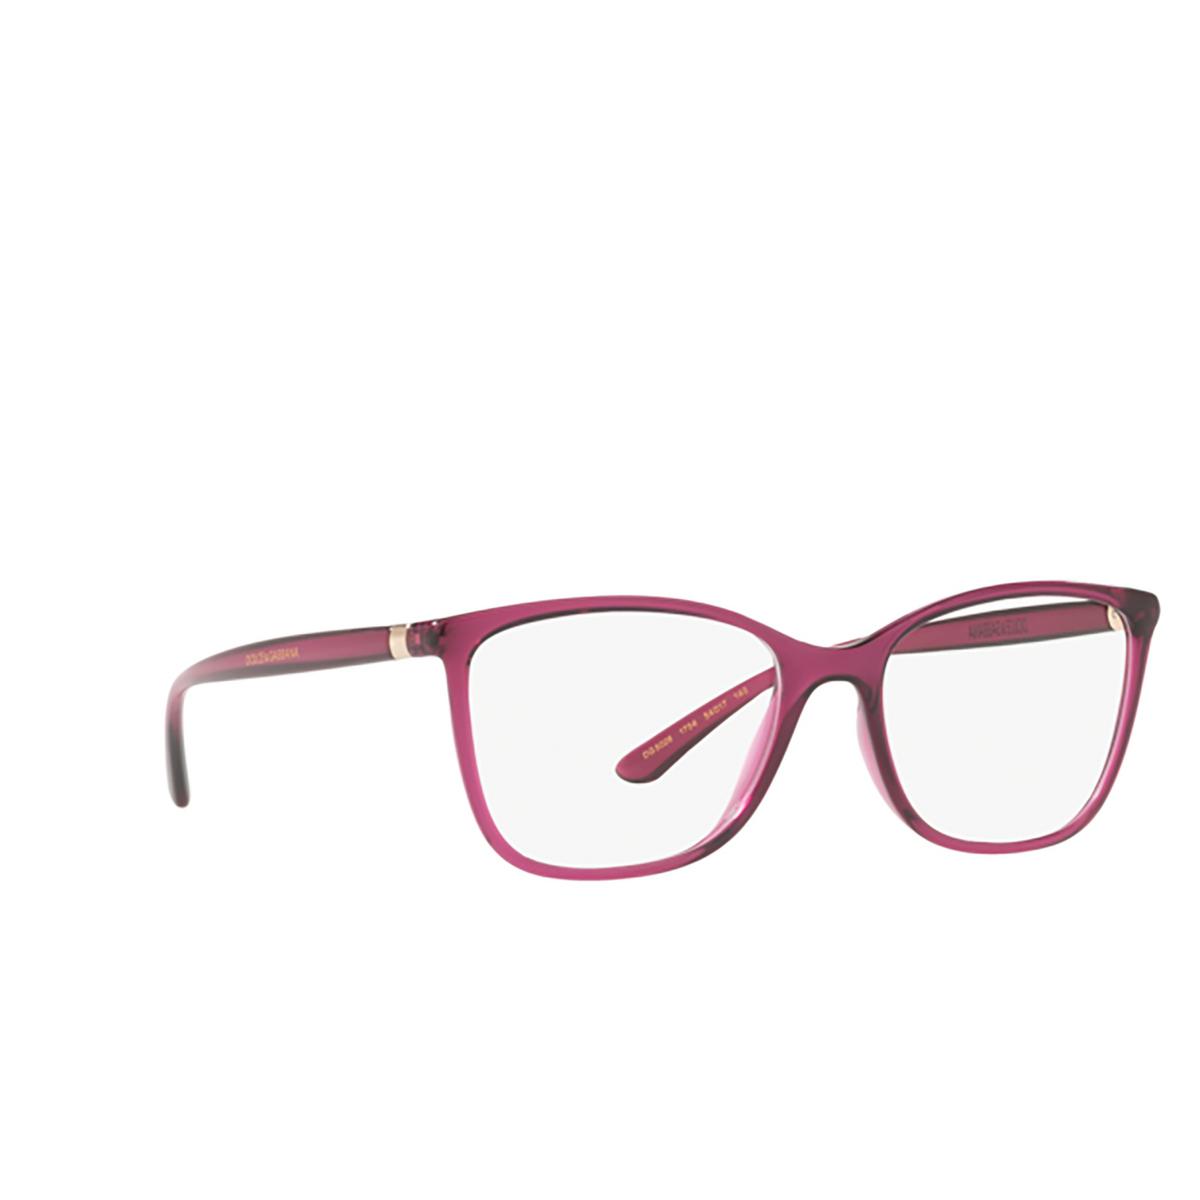 Dolce & Gabbana® Rectangle Eyeglasses: DG5026 color Transparent Dark Cherry 1754 - three-quarters view.